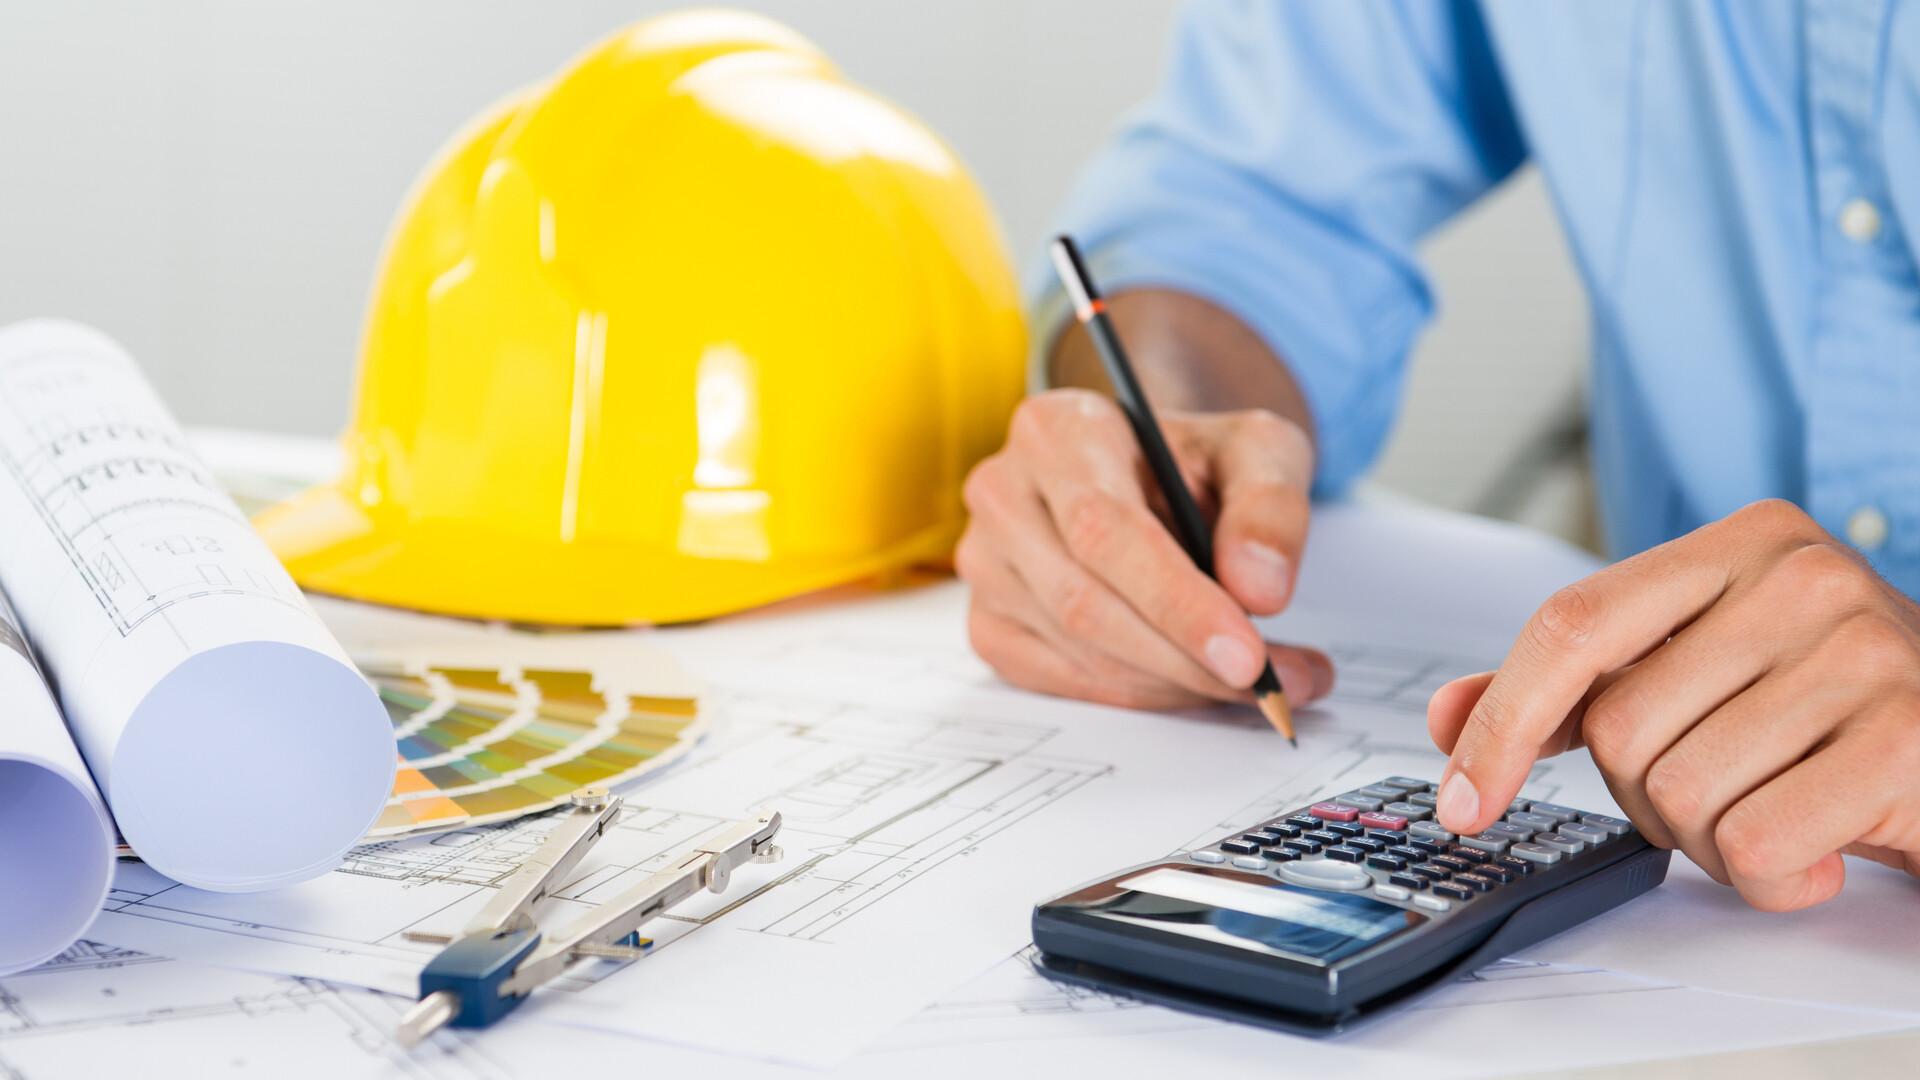 calculator, helm, tools